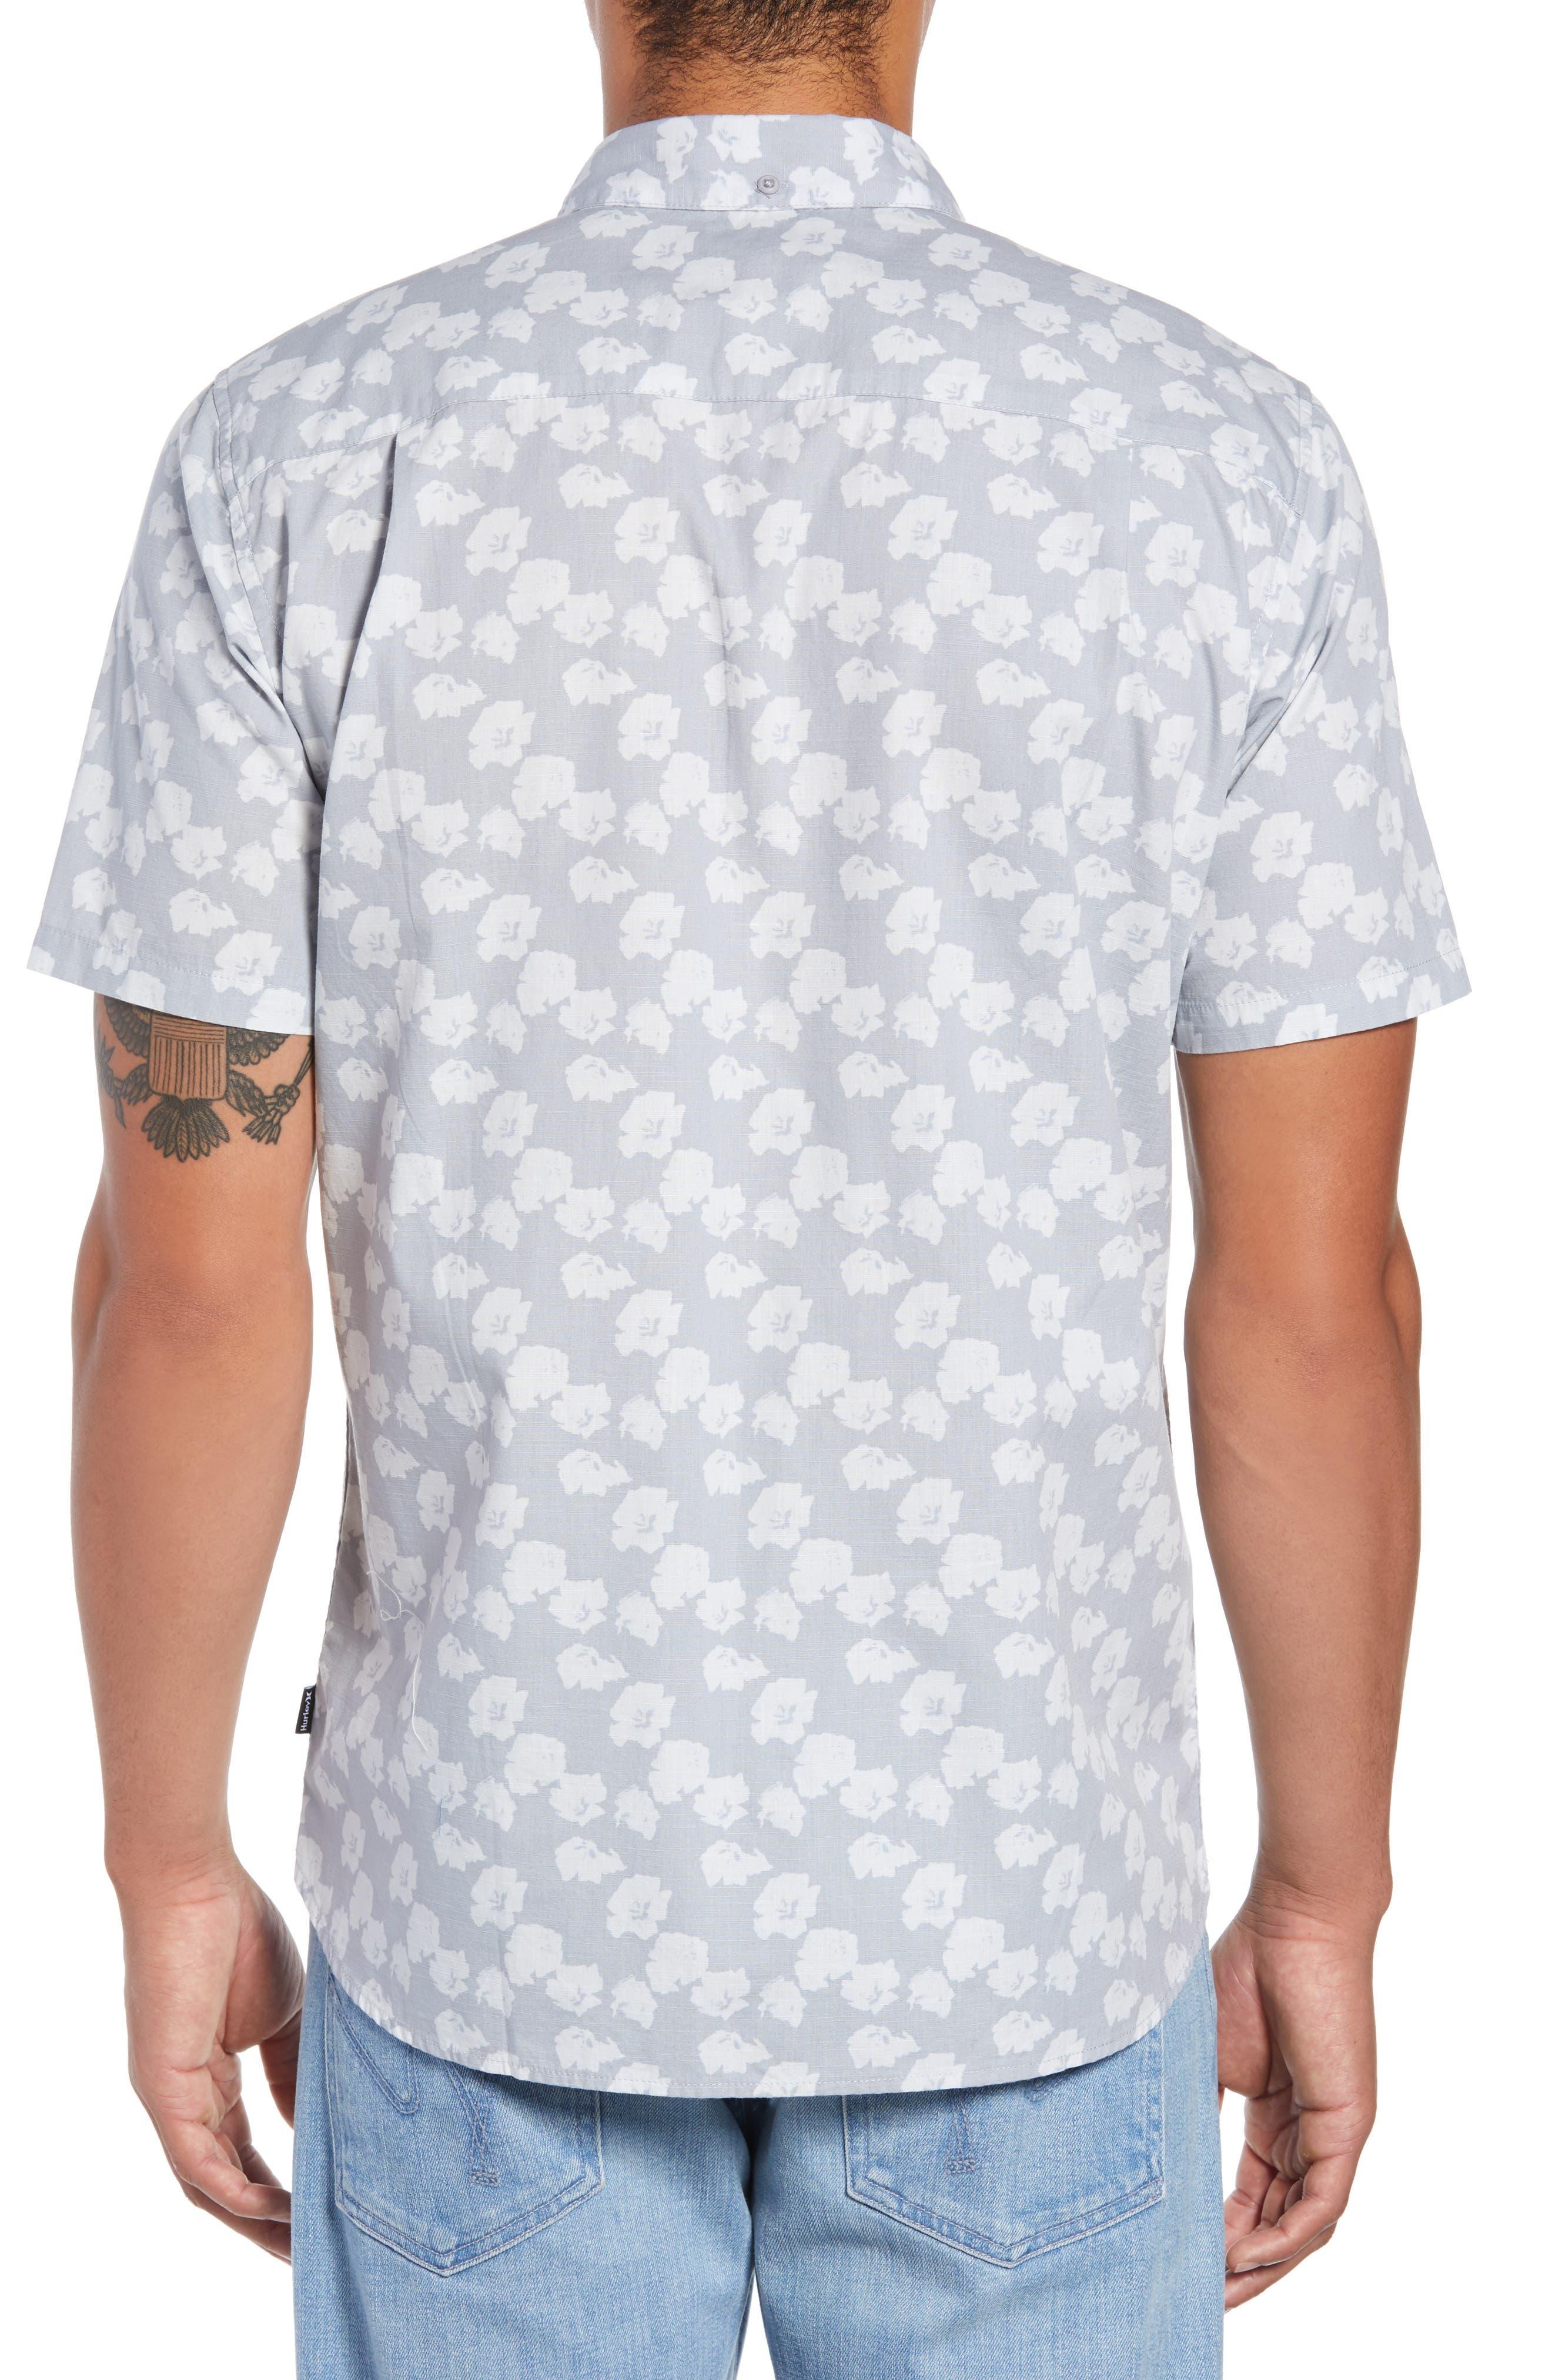 Beachside Swarm Print Woven Shirt,                             Alternate thumbnail 3, color,                             WOLF GREY